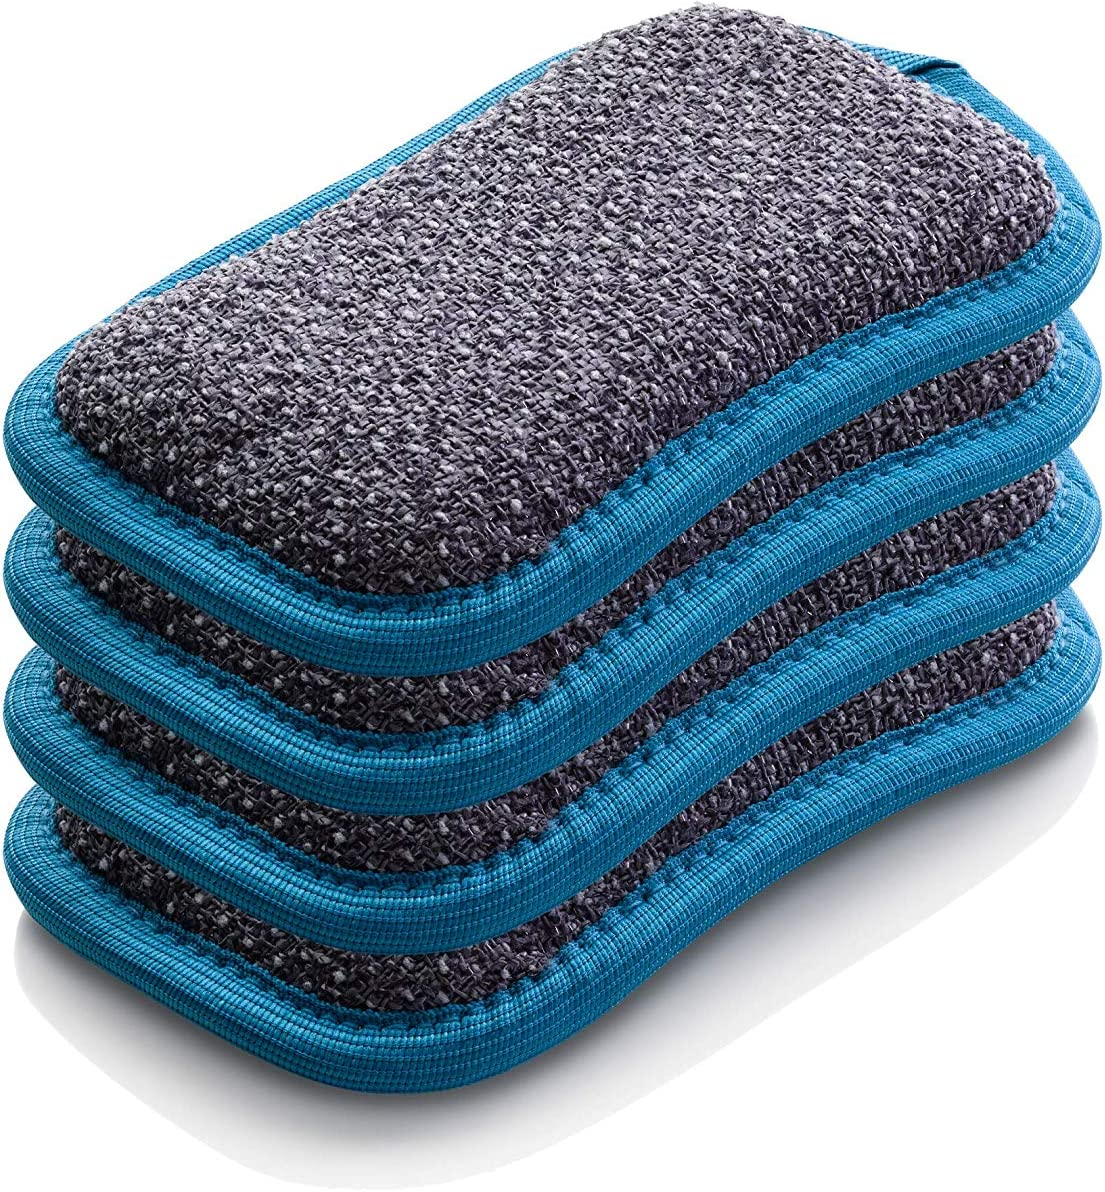 E-Cloth Microfiber Dual Purpose Washing Up Pad, Blue, 4 Count